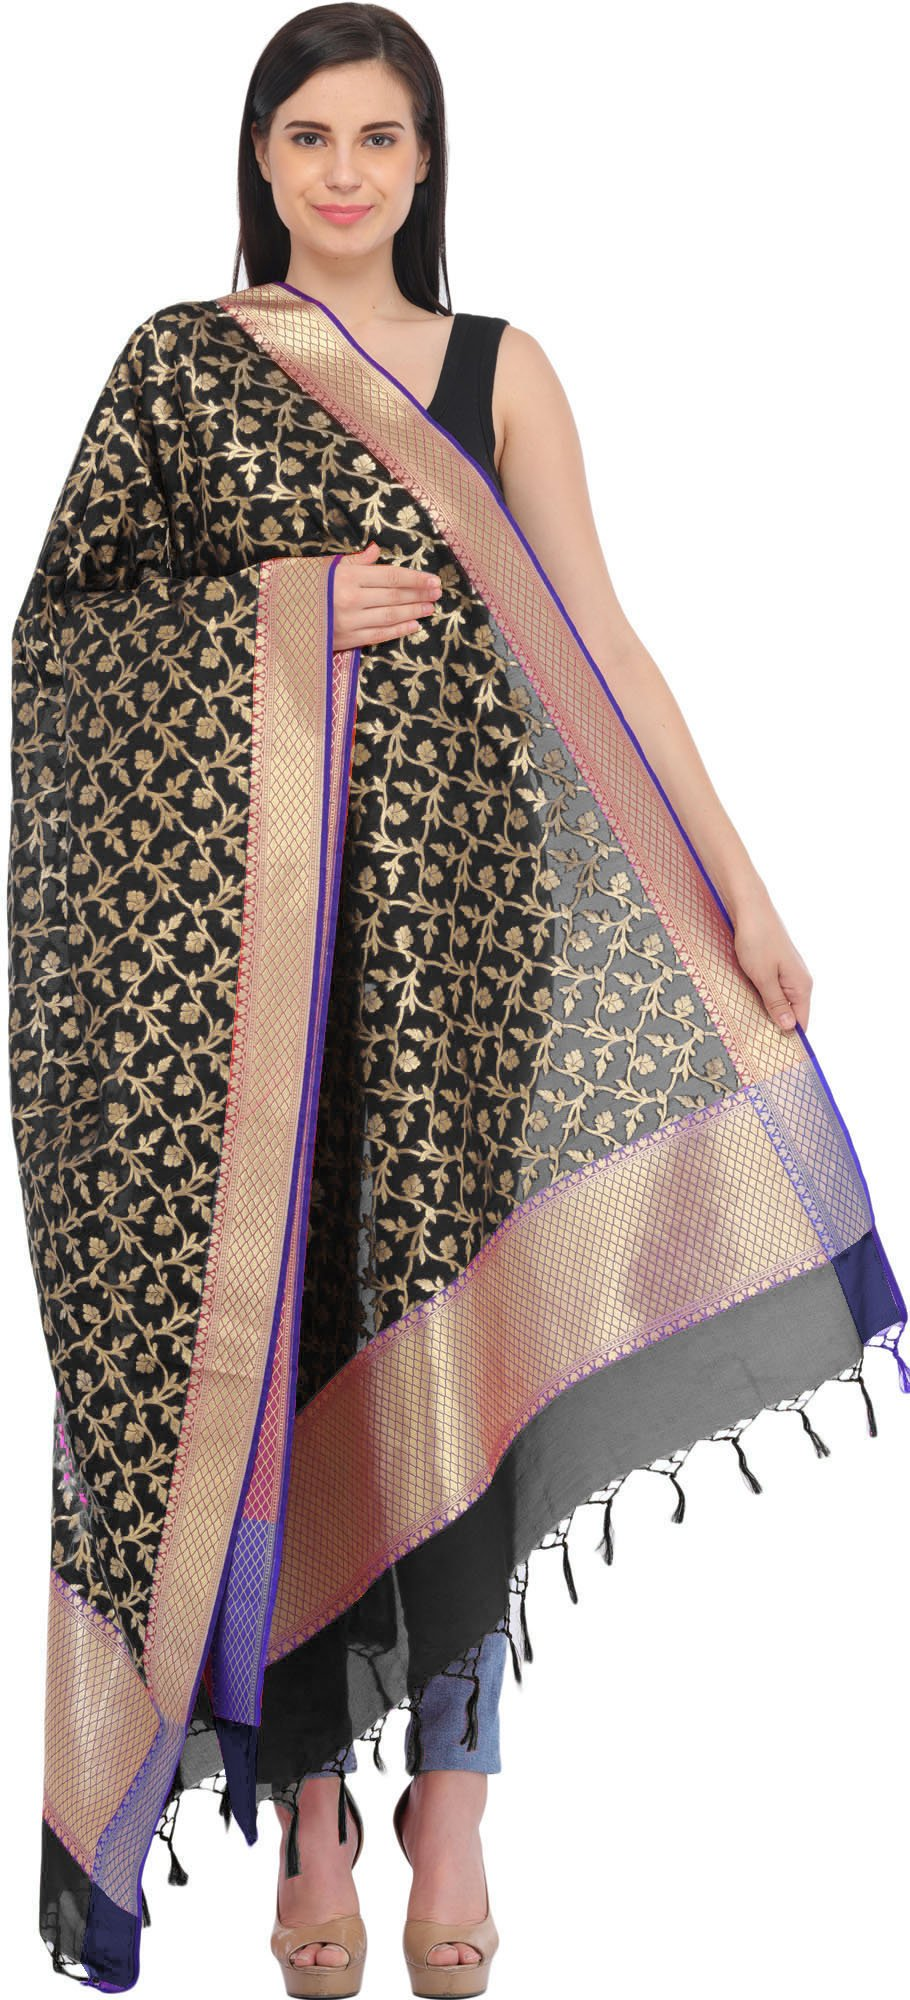 Exotic India Banarasi Brocaded Dupatta with Floral Weav - Color Jet Black